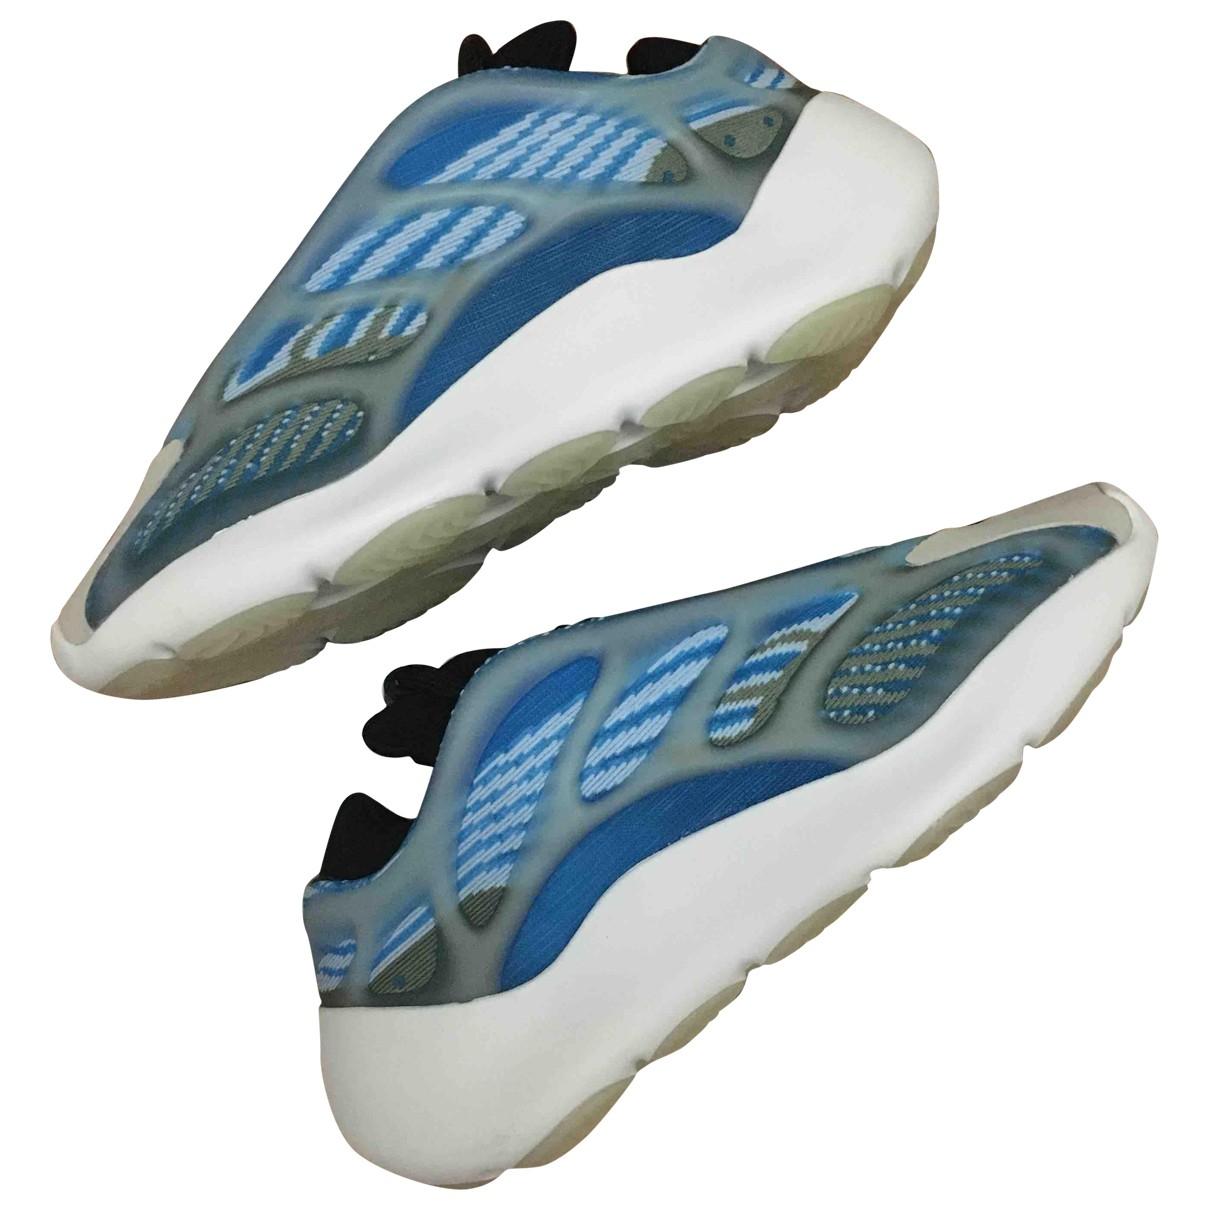 Yeezy X Adidas - Baskets Boost 700 V3 pour femme en suede - bleu